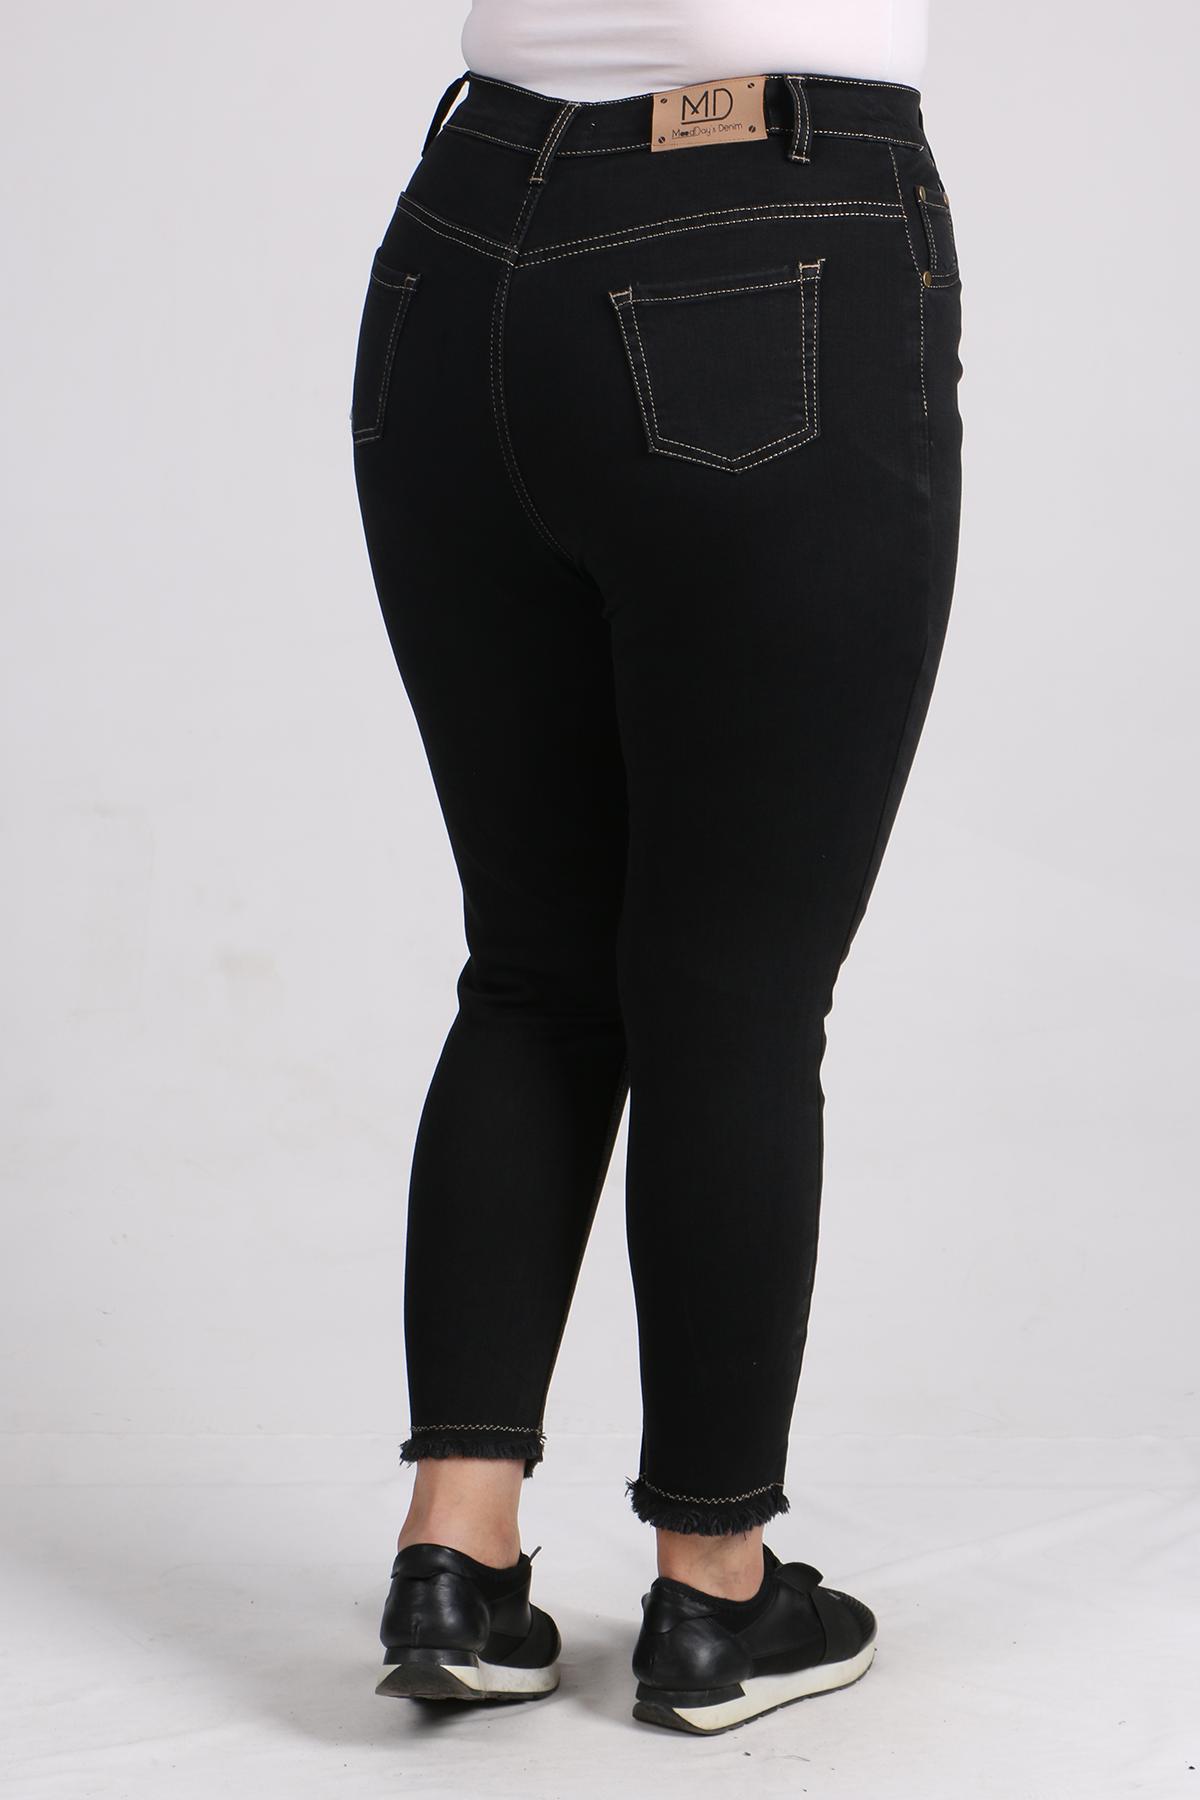 9112 Plus Size Skinny Leg Jeans - Black